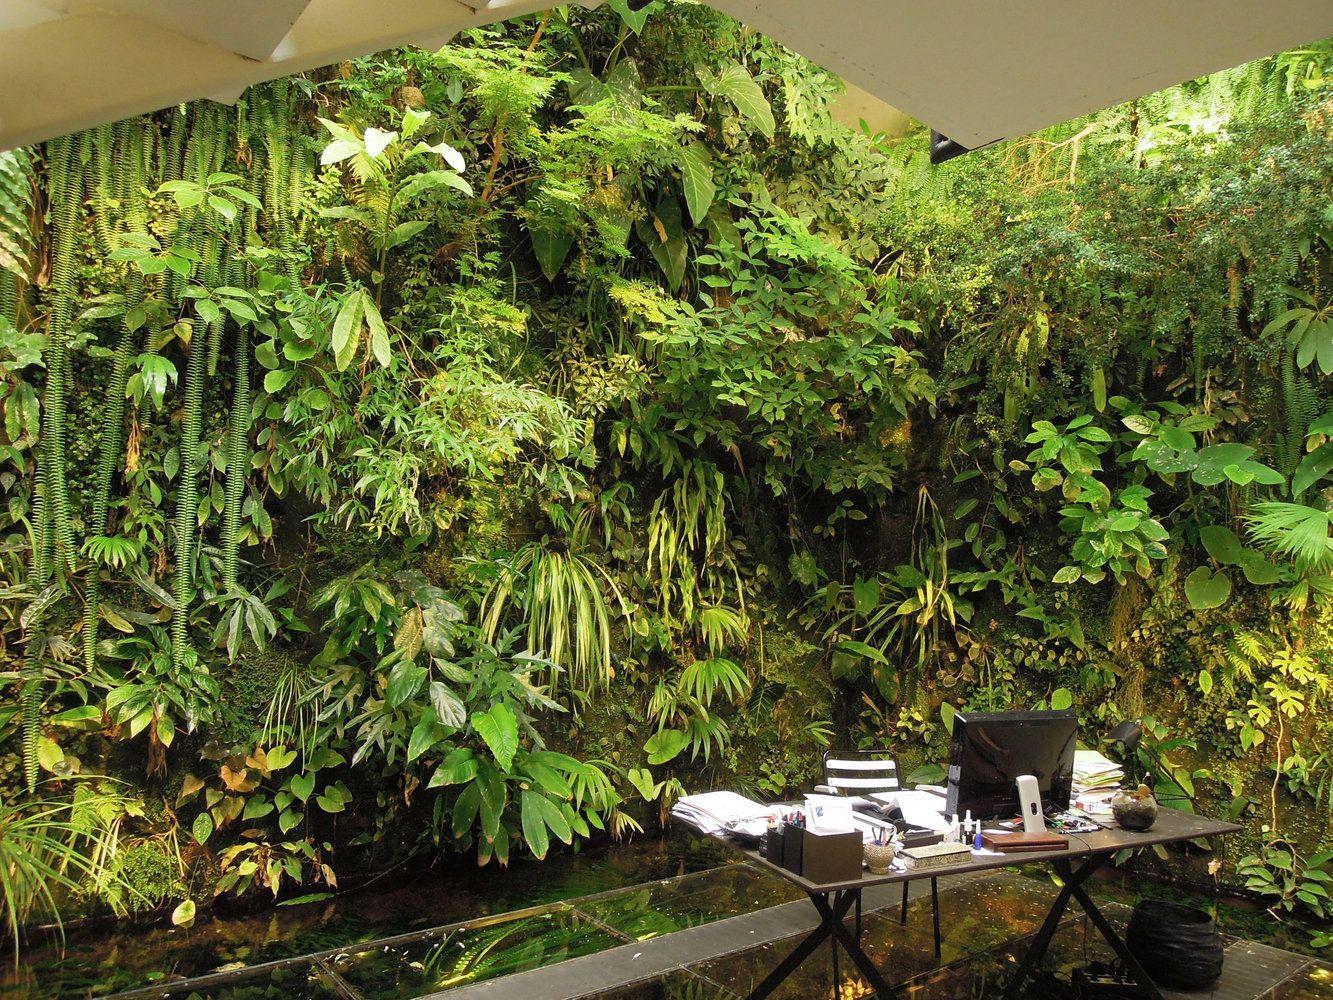 25 Mesmerizing Vertical Garden Ideas That Will Refresh